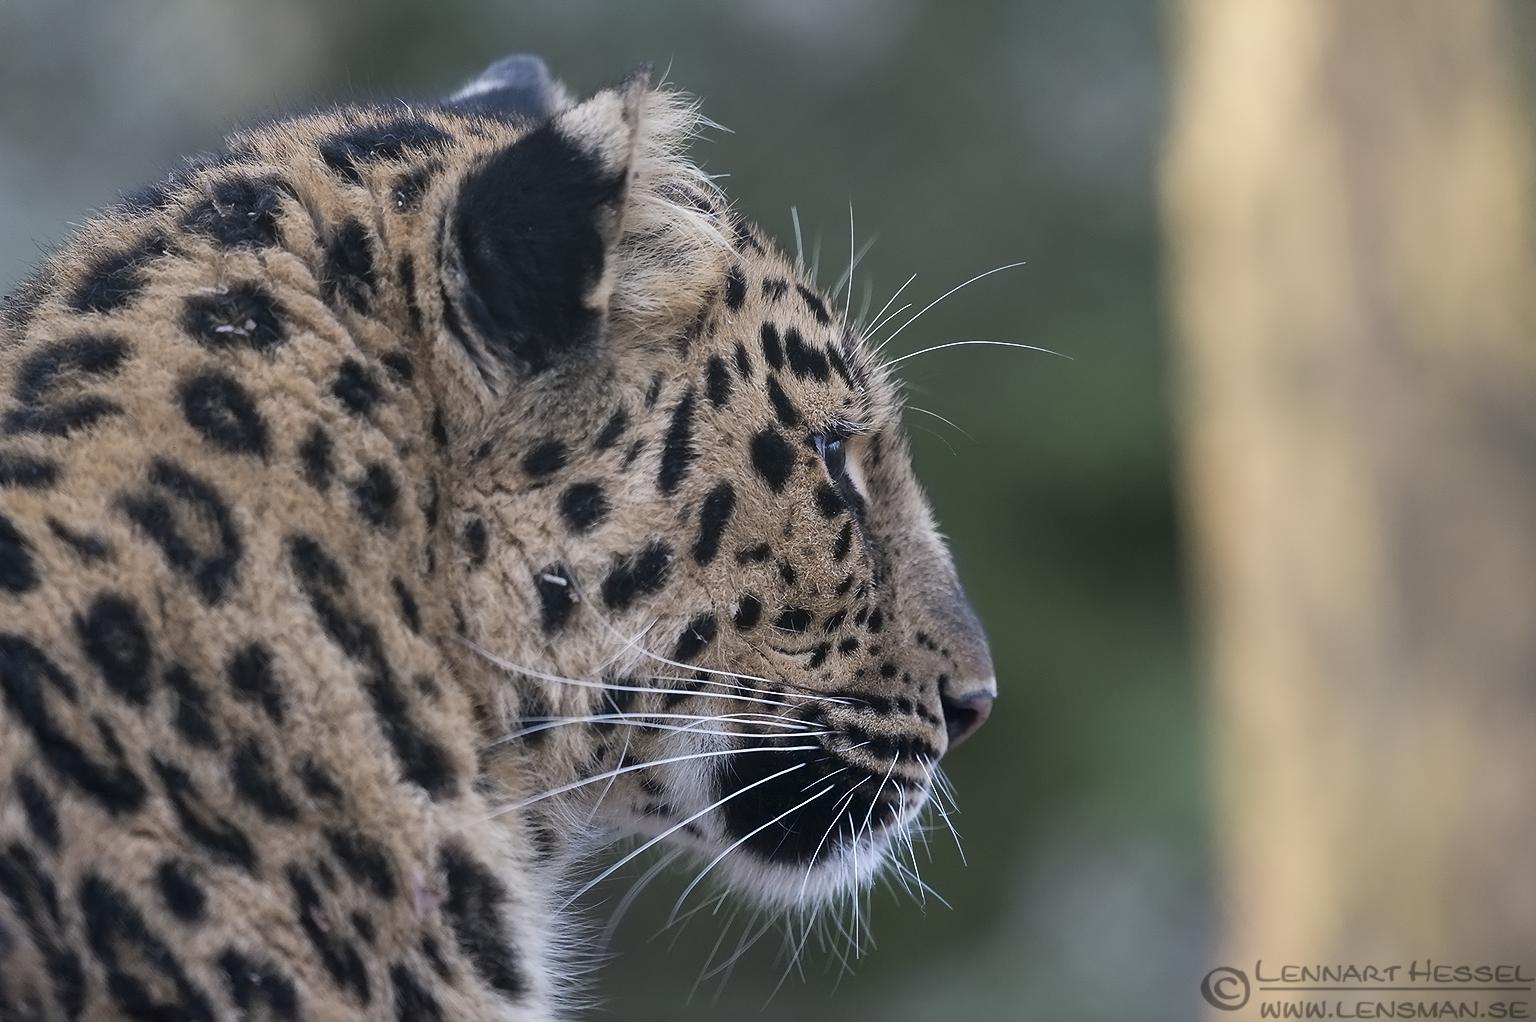 Amur leopard at Nordens Ark